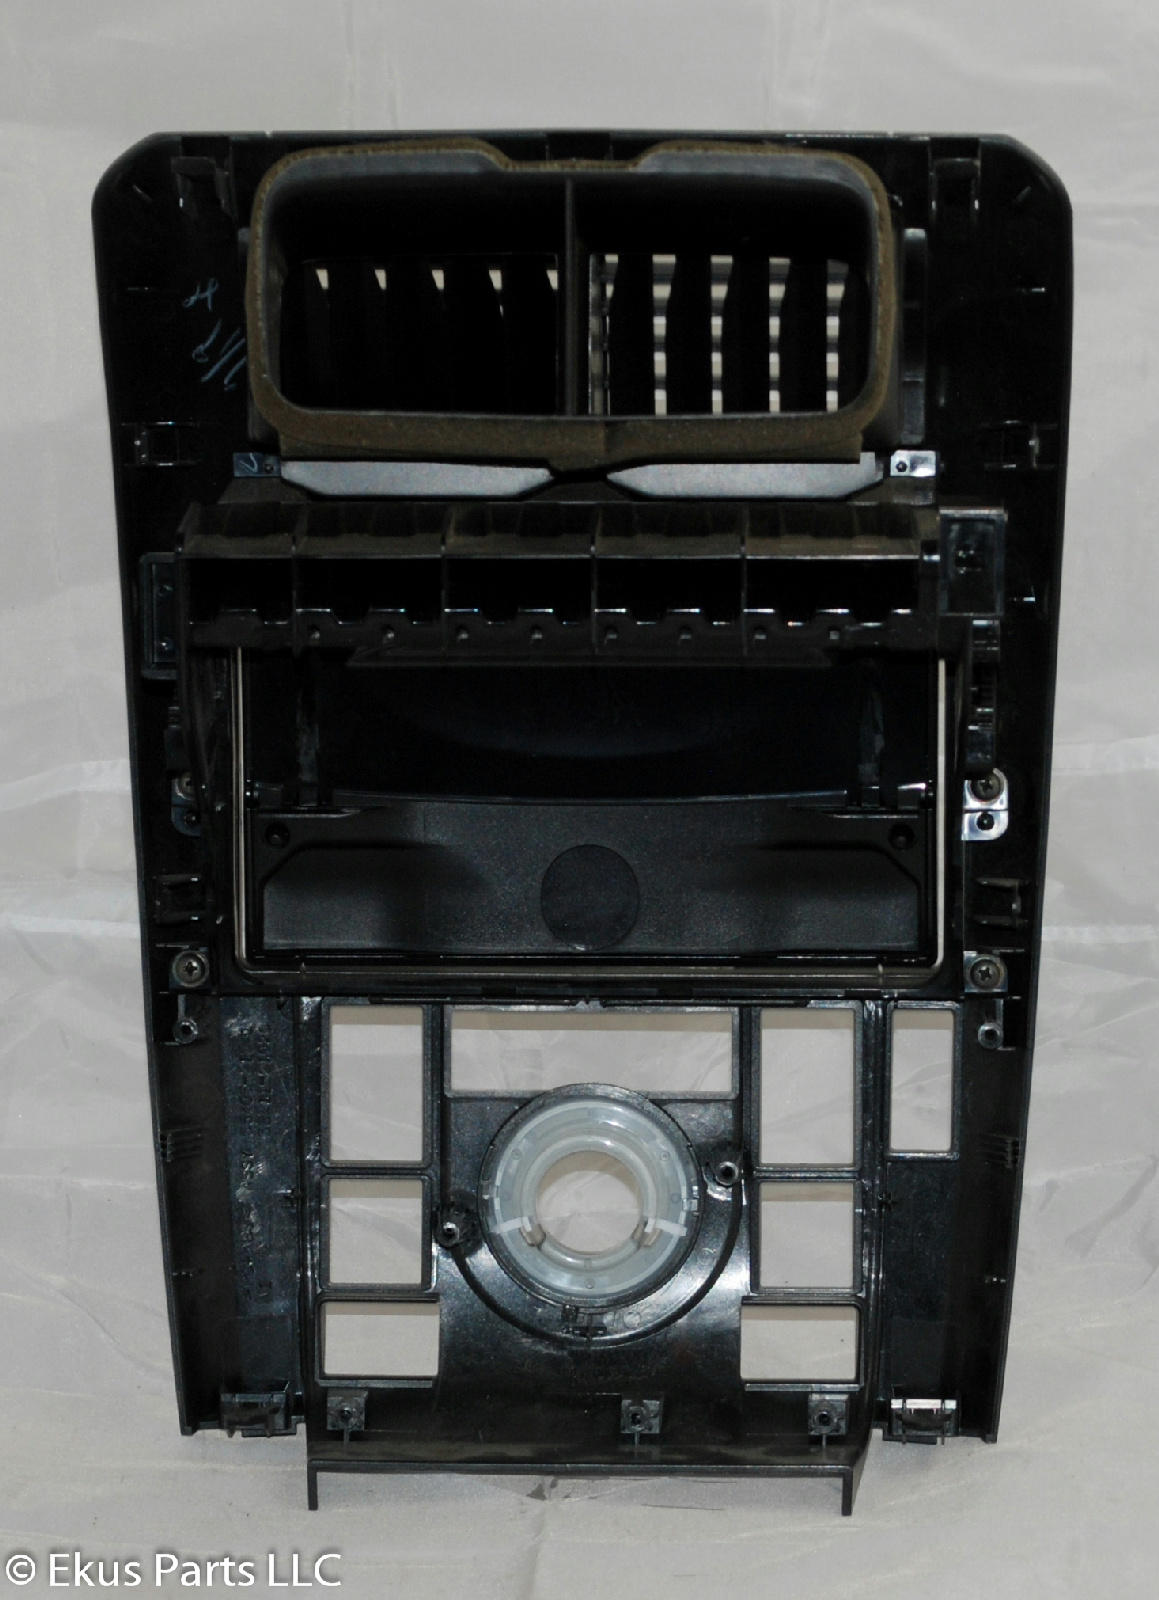 2009 Scion Tc Radio Climate Dash Trim Bezel With Vents Ebay